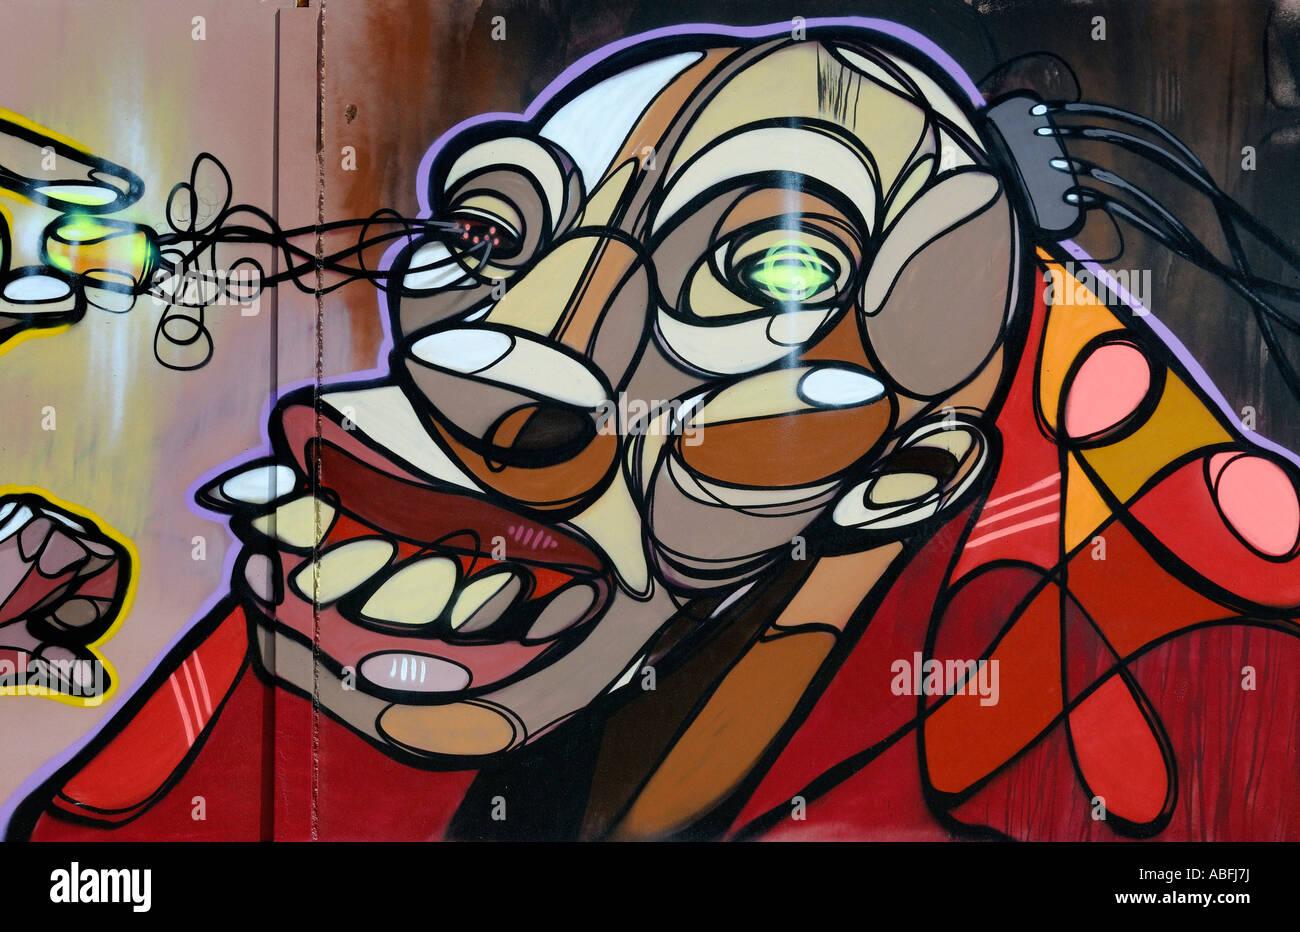 GRAFFITI-ILLUSTRATION Stockbild